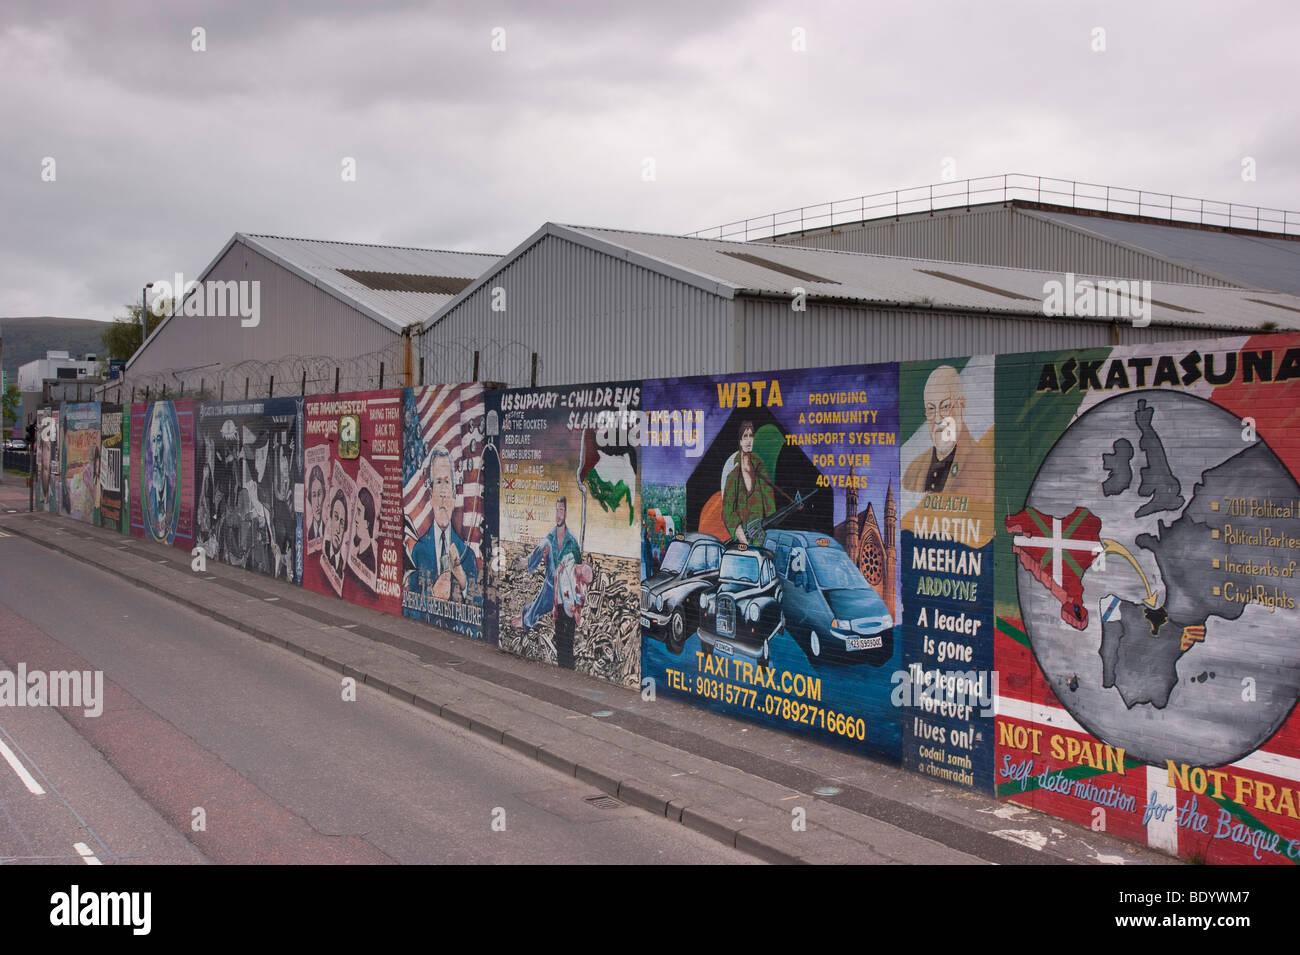 Belfast Ireland 2009 Sinn Fein and other political wall art Museum of Irish Republican History - Stock Image